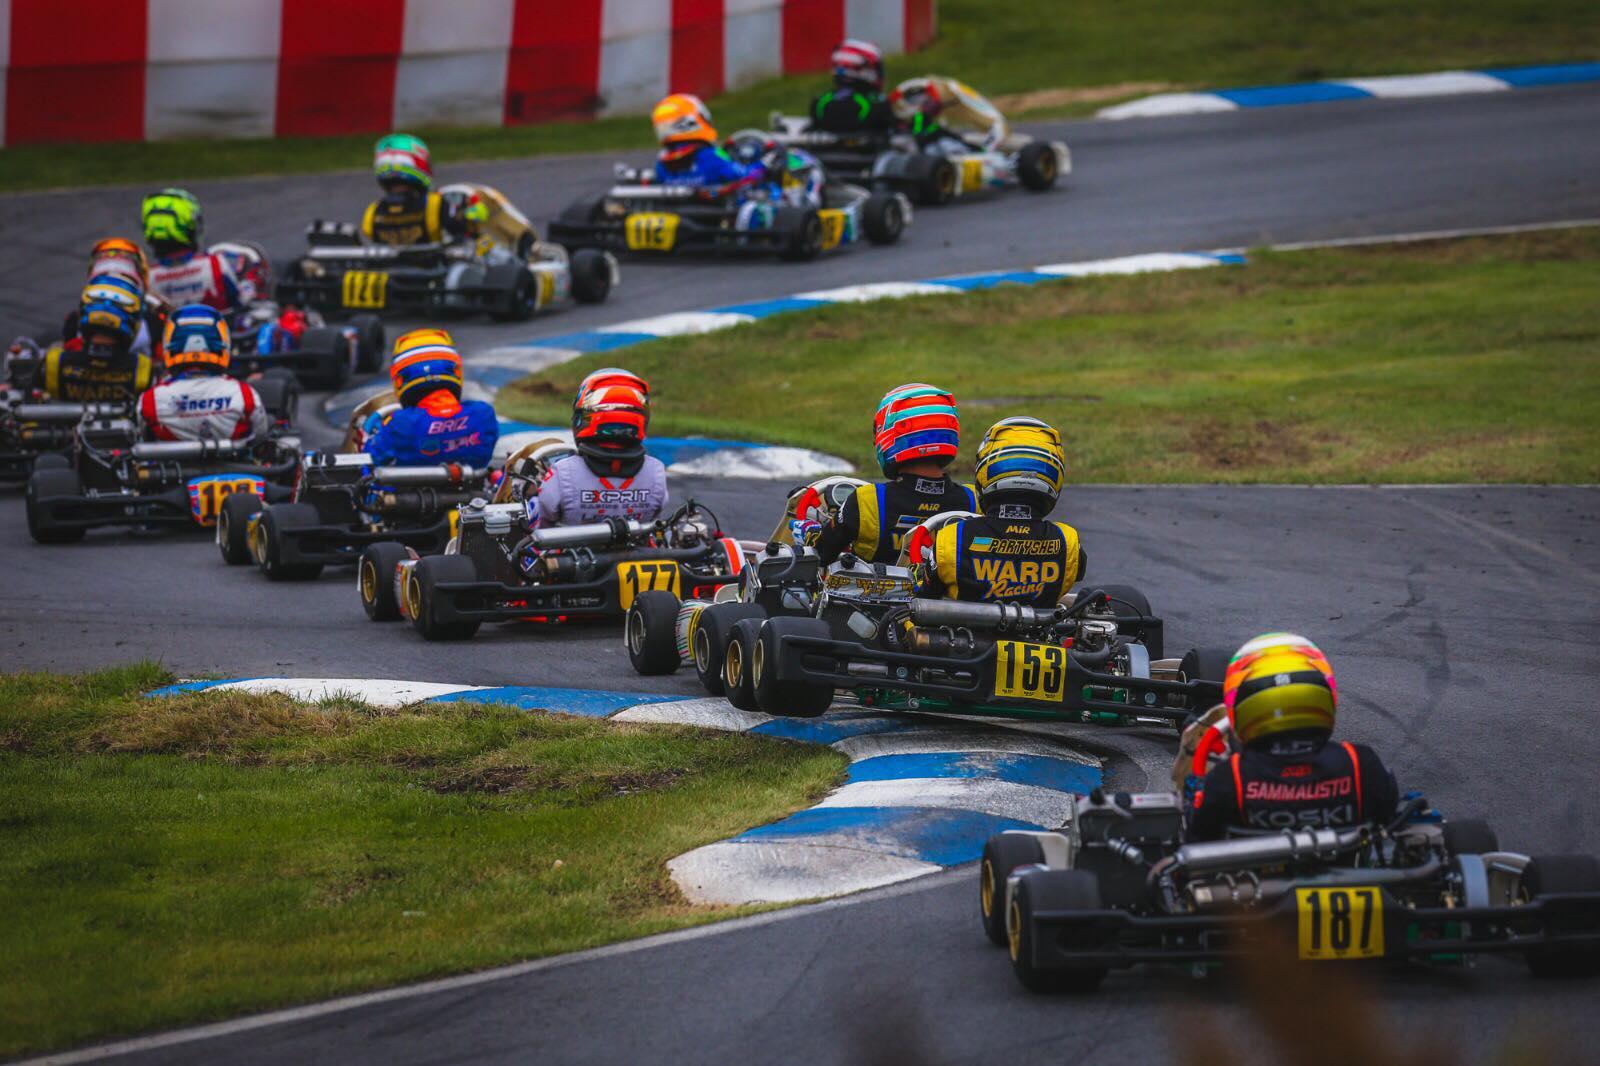 FIA World Championship - Heats